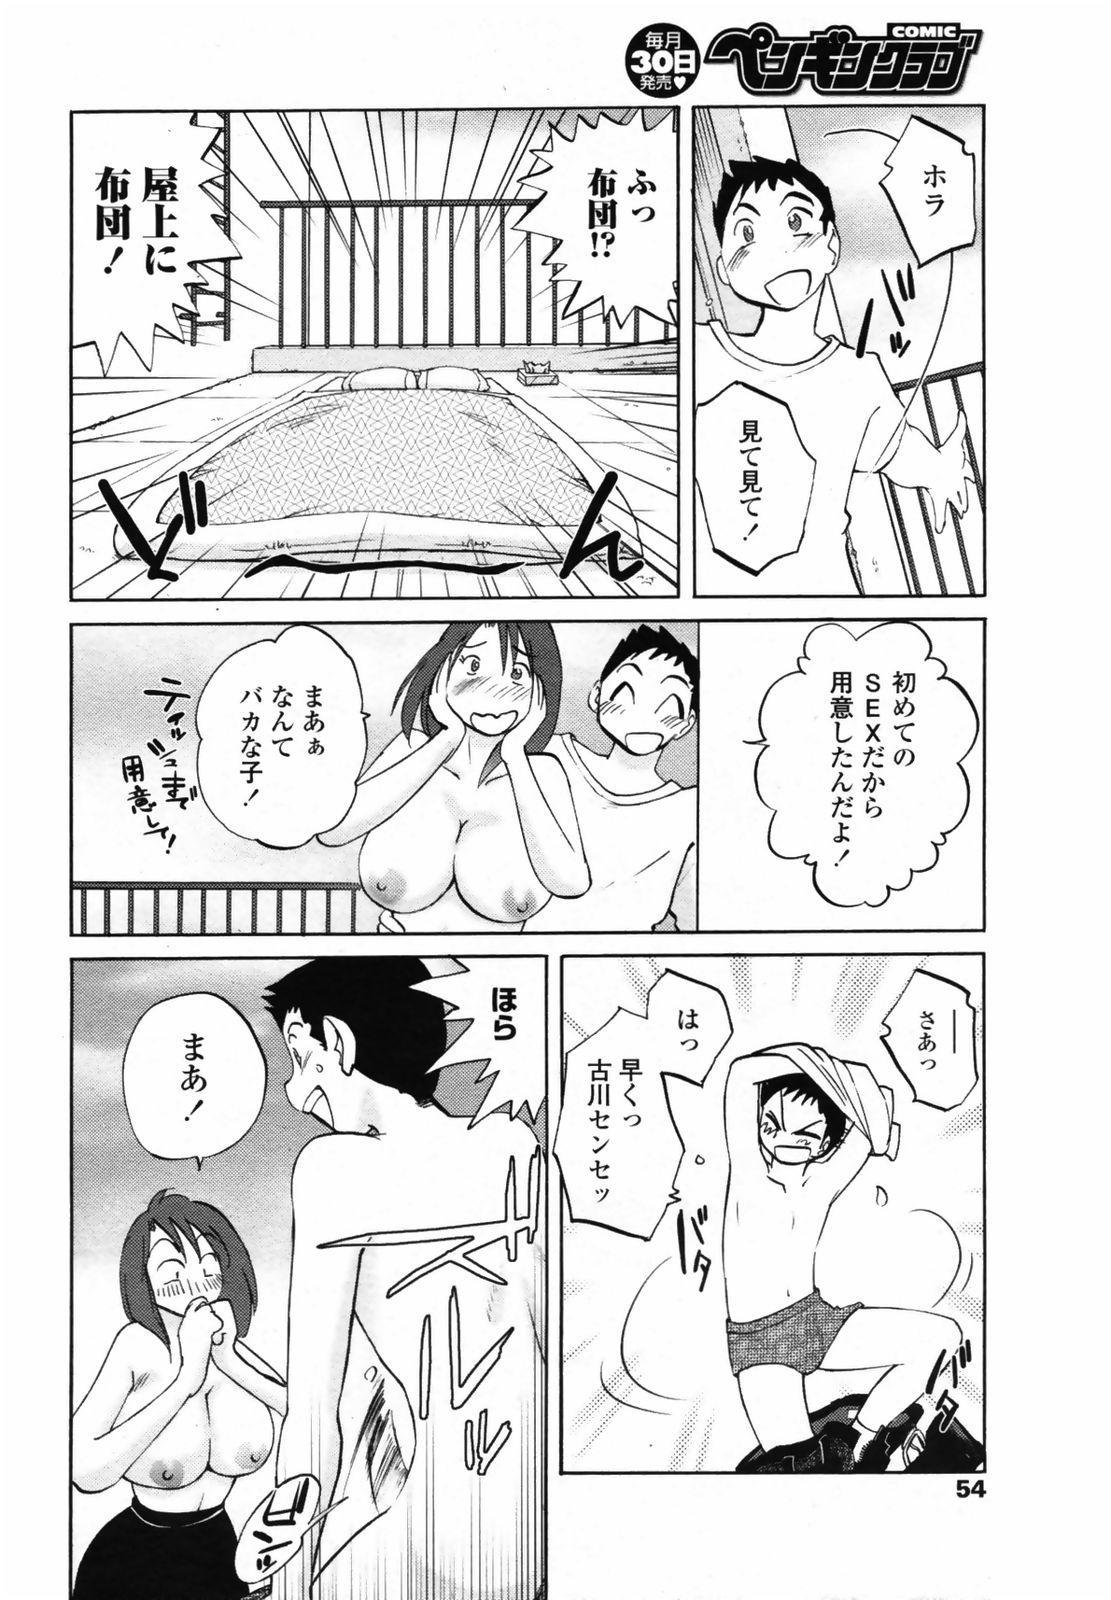 [Tsuyatsuya] Azumi-kun to Issho chapt.1-5 (Comic Penguin Club) 5